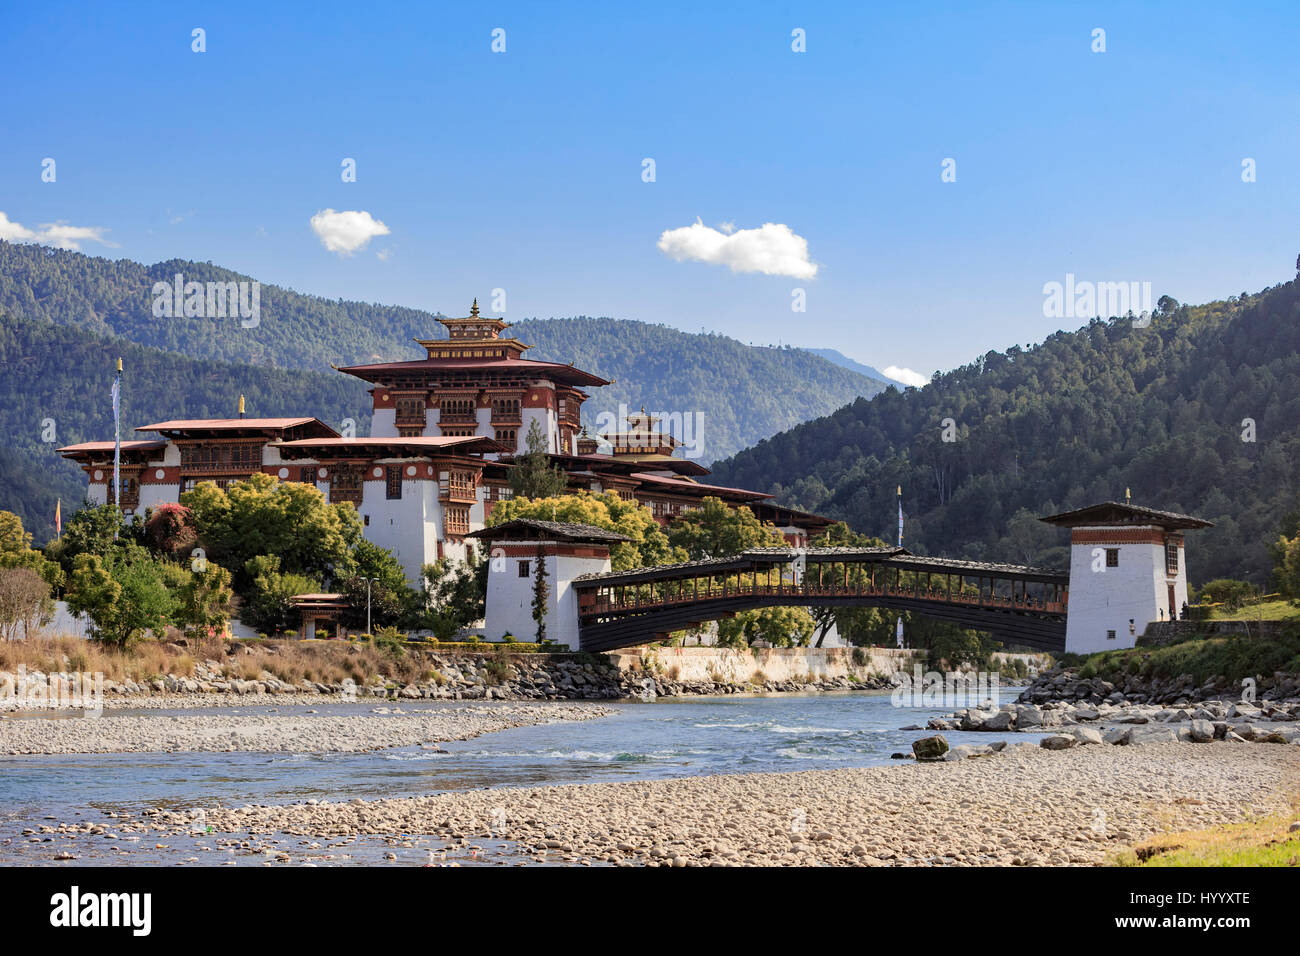 Bhutaanse dating Royal Albert backstamp dating